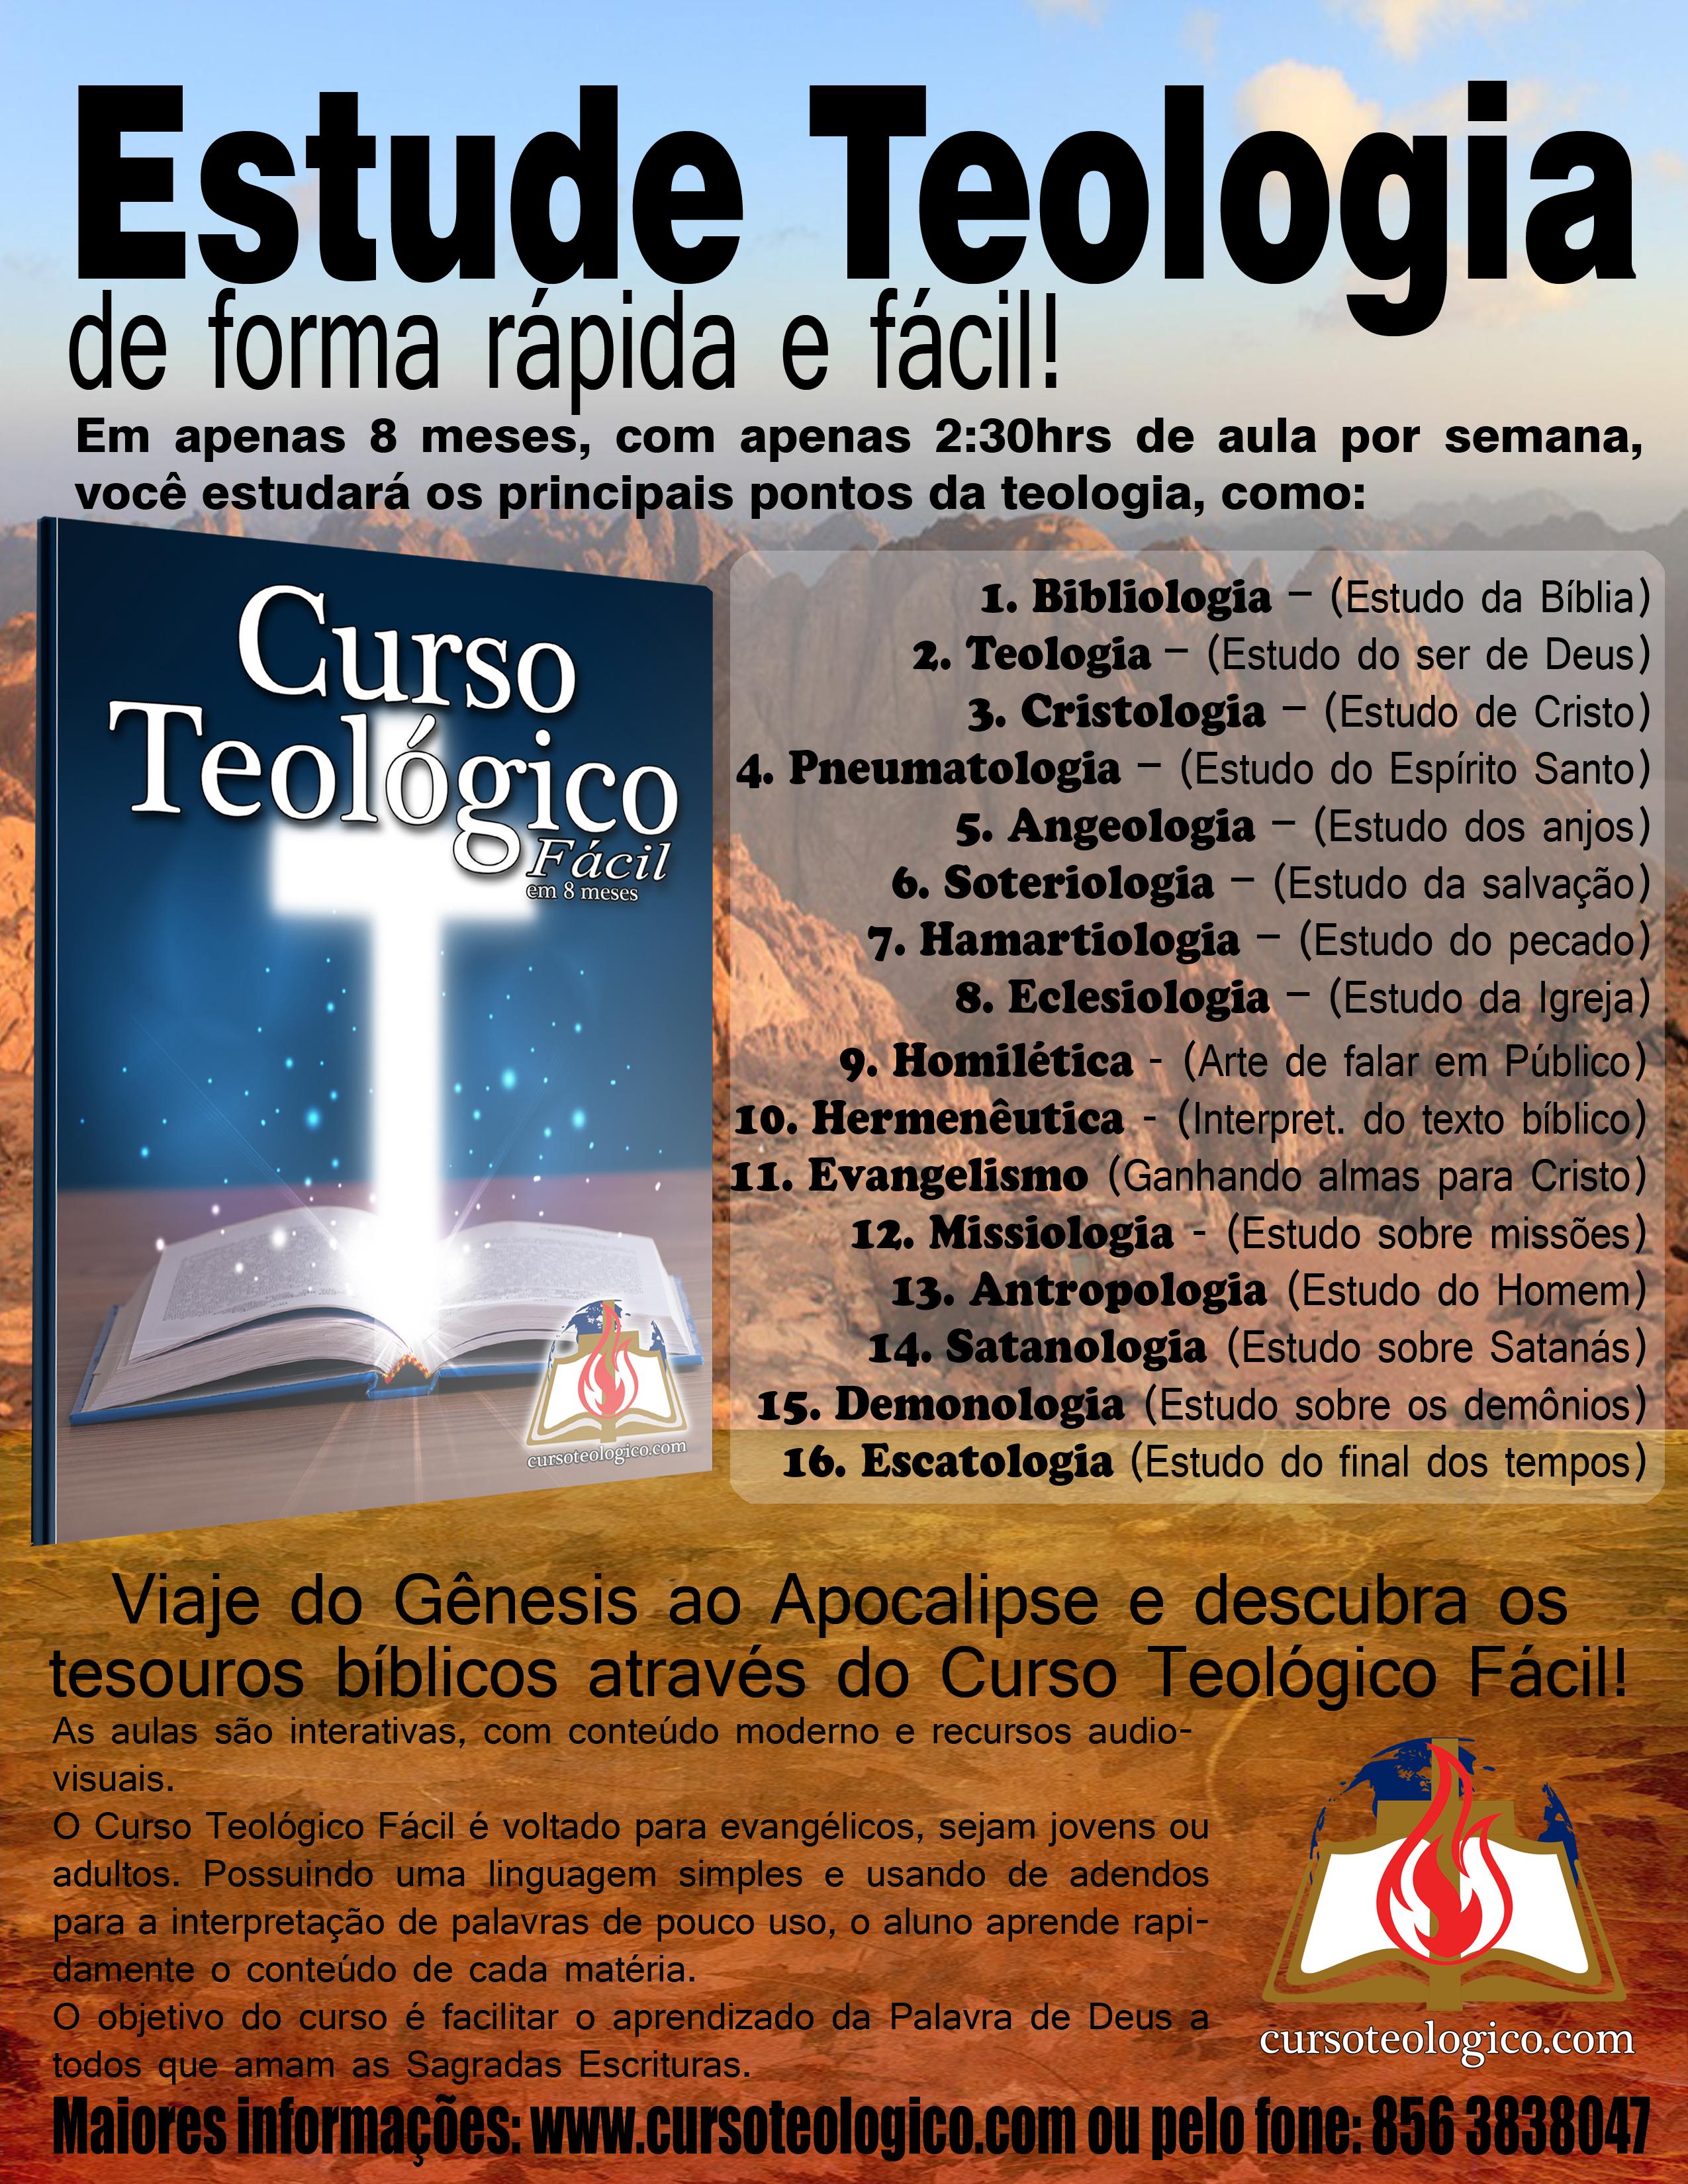 Curso Teológico Fácil - Escatologia